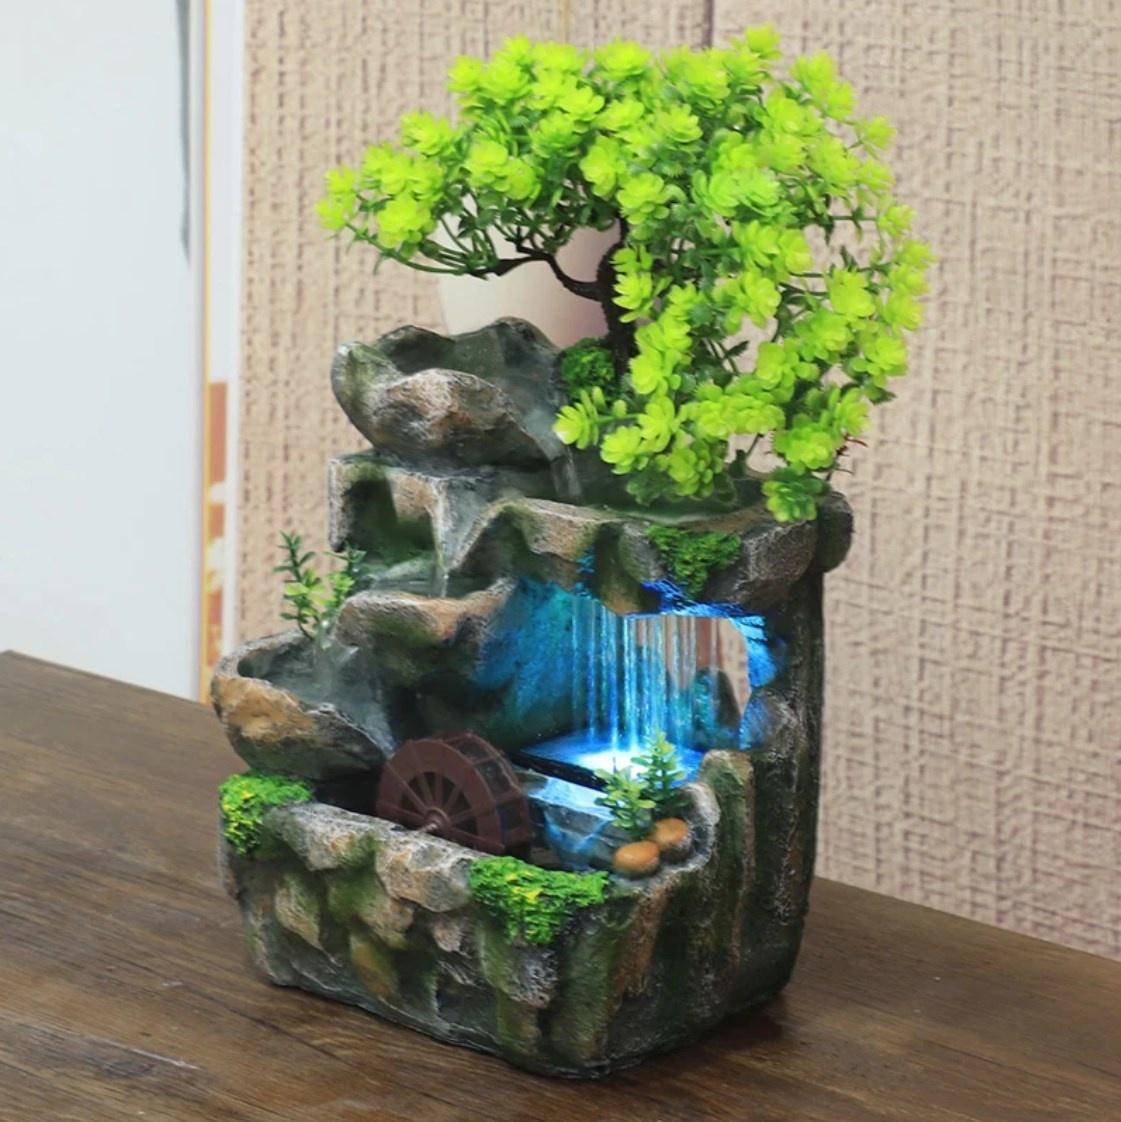 Sier Waterval Zen Garden Watermolen - Bonsai Boom Feng Shui Fontein Decor Ornament